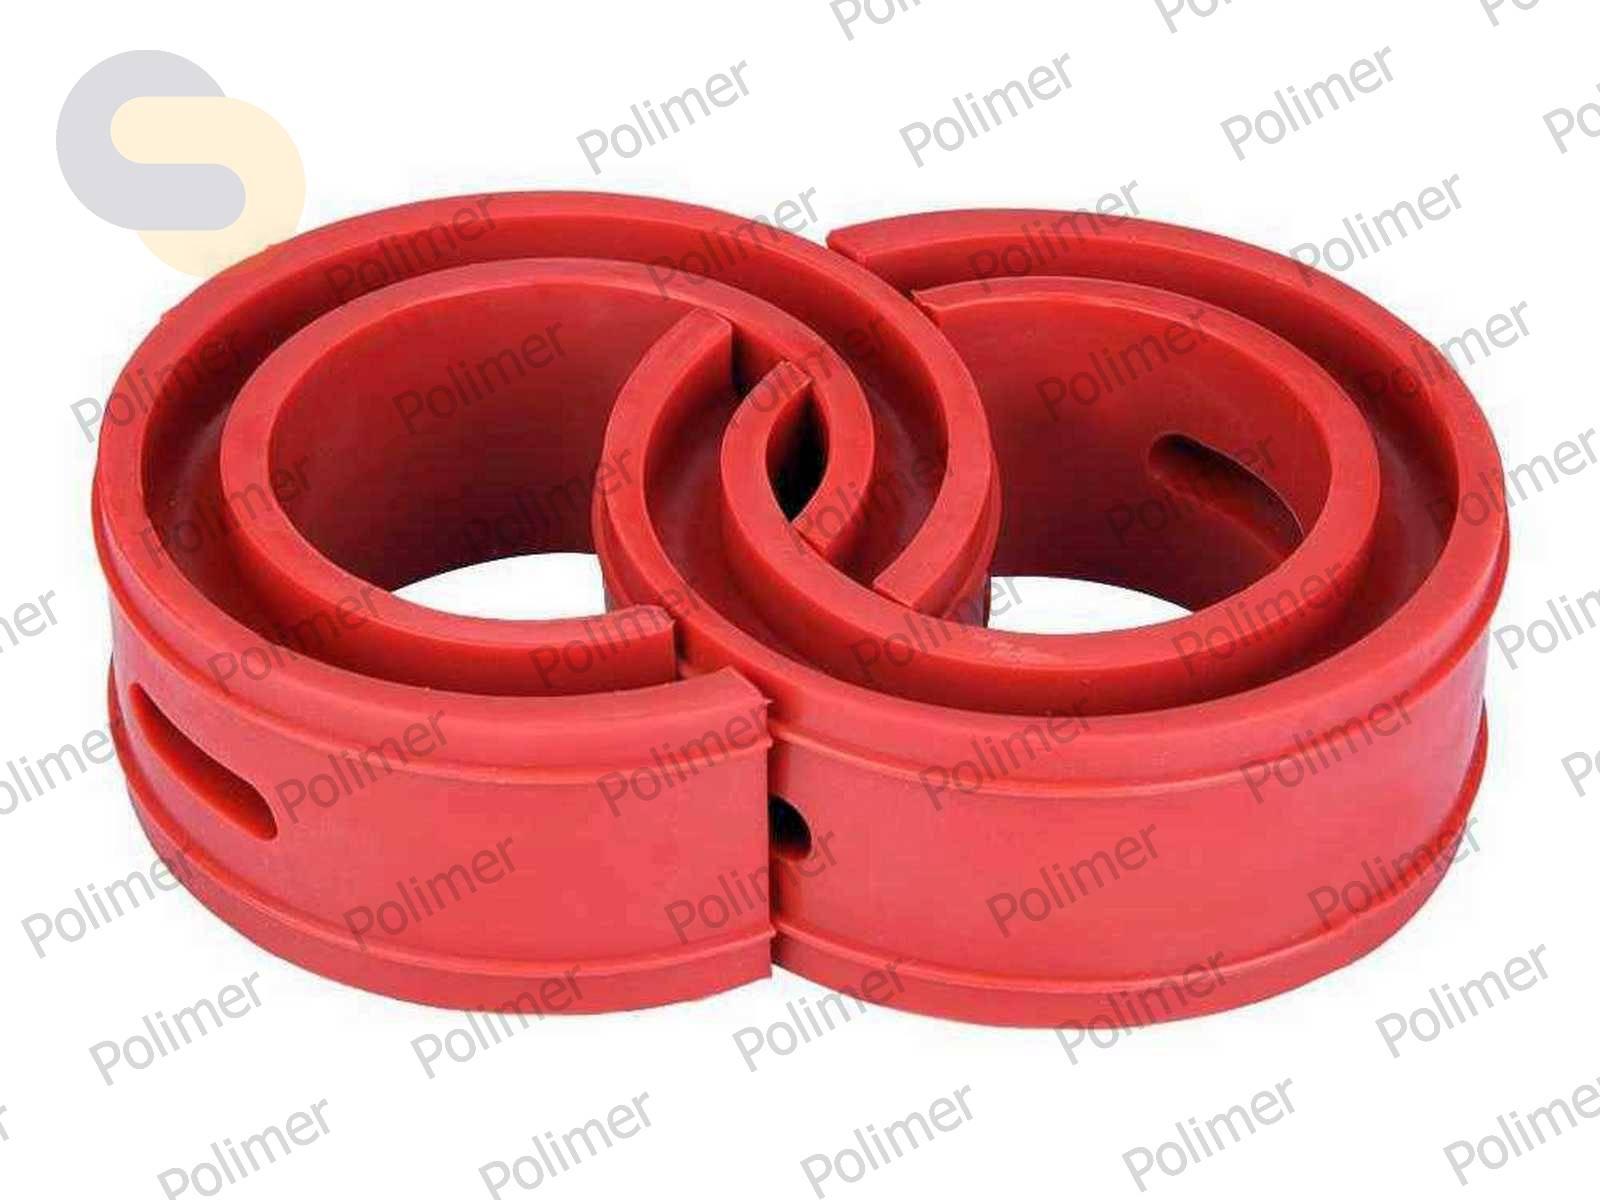 http://polimer-nsk.ru/web/pkl/Size-A-RED.jpg